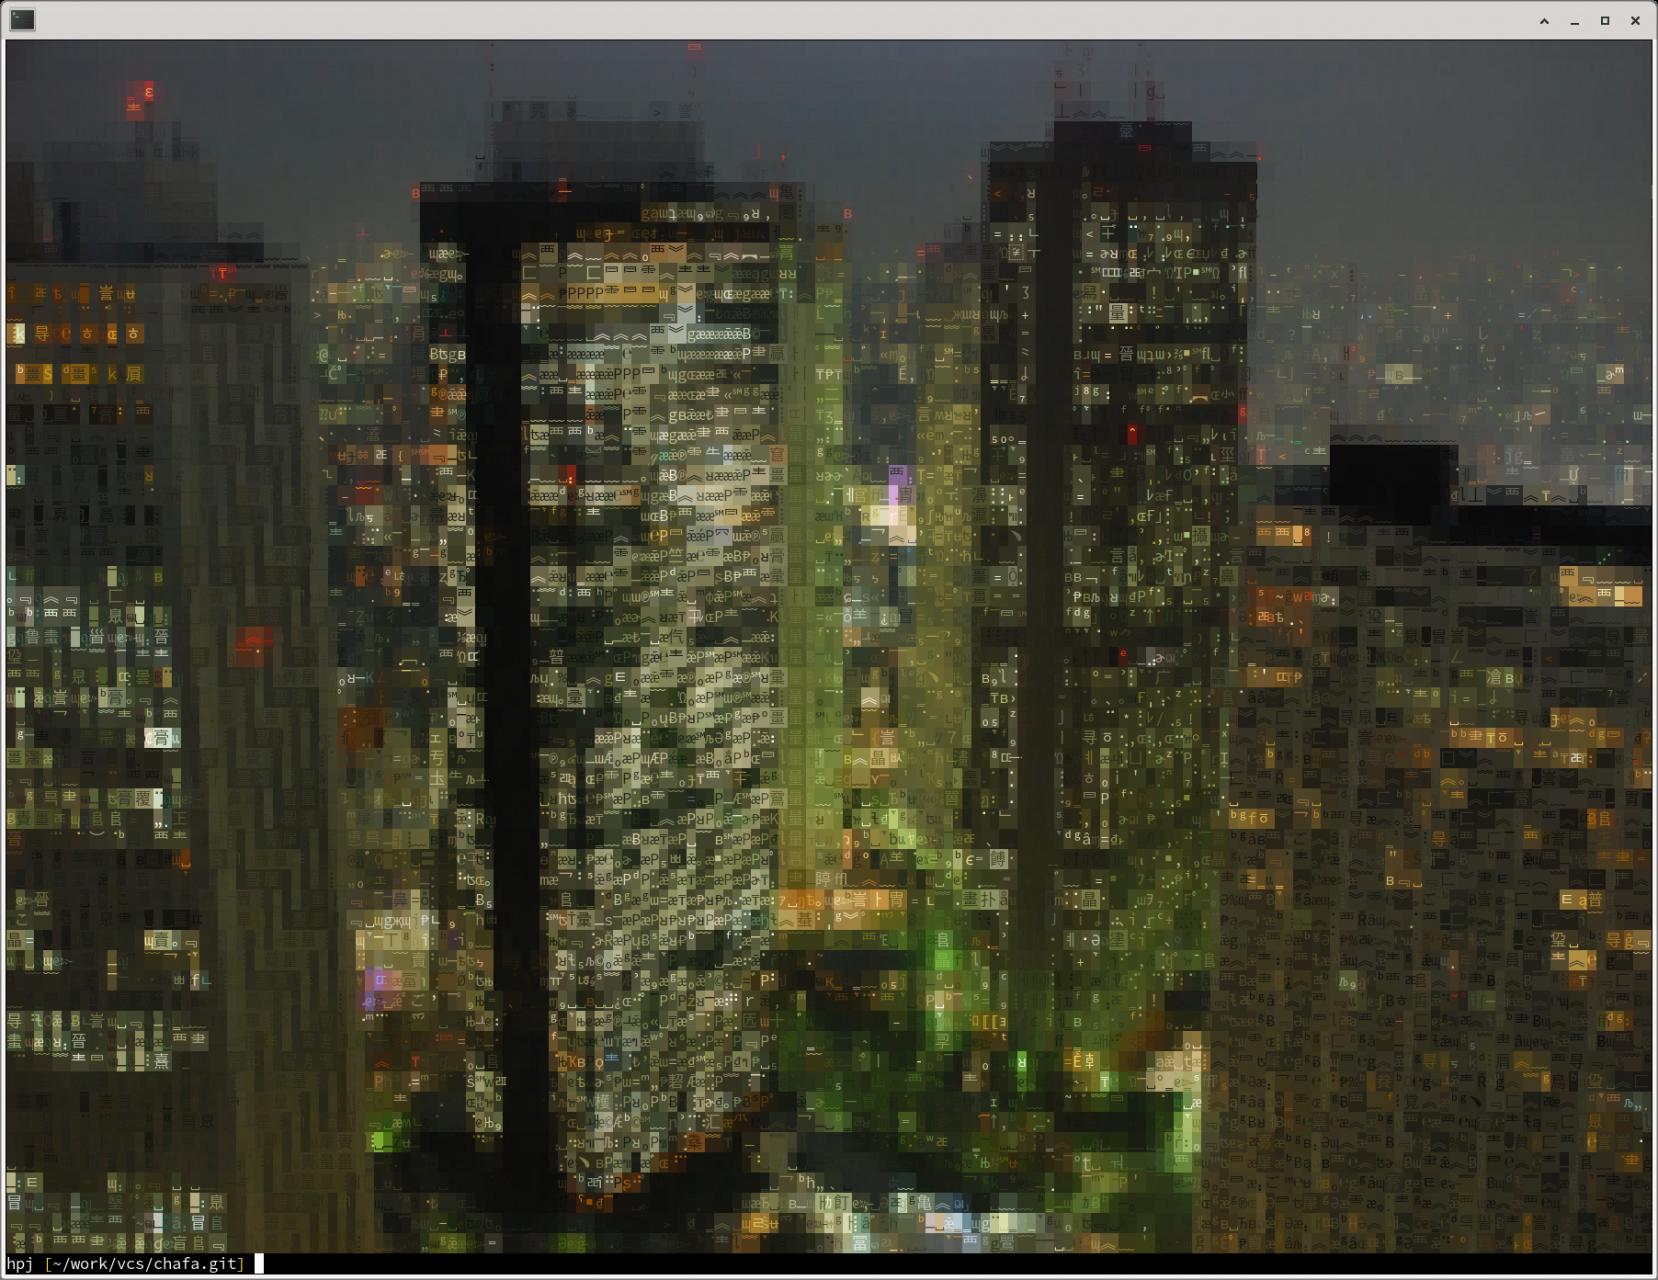 Chafa rendering of Shinjuku Skyscrapers